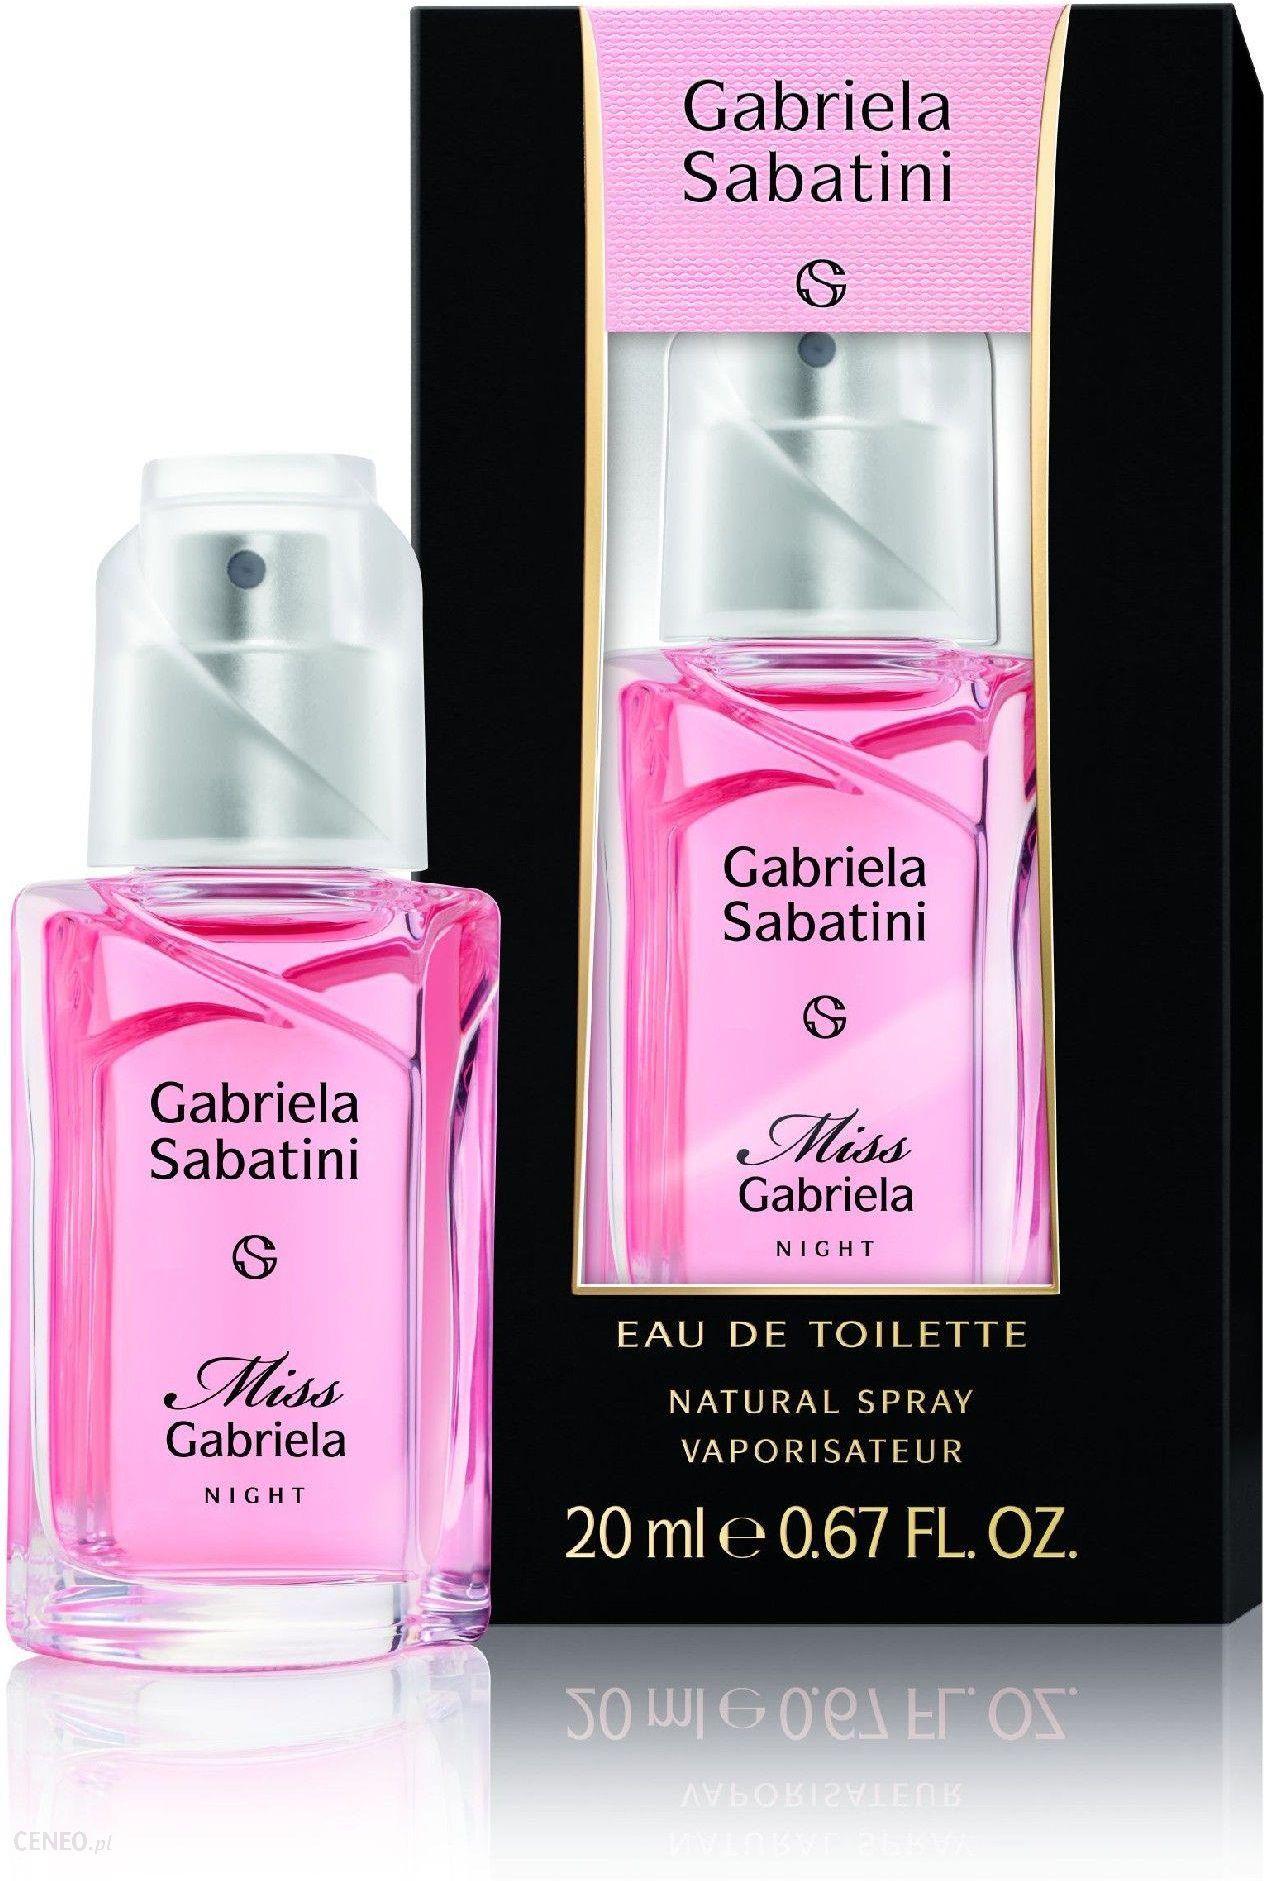 Gabriela Sabatini Miss Gabriela Night woda toaletowa 20ml